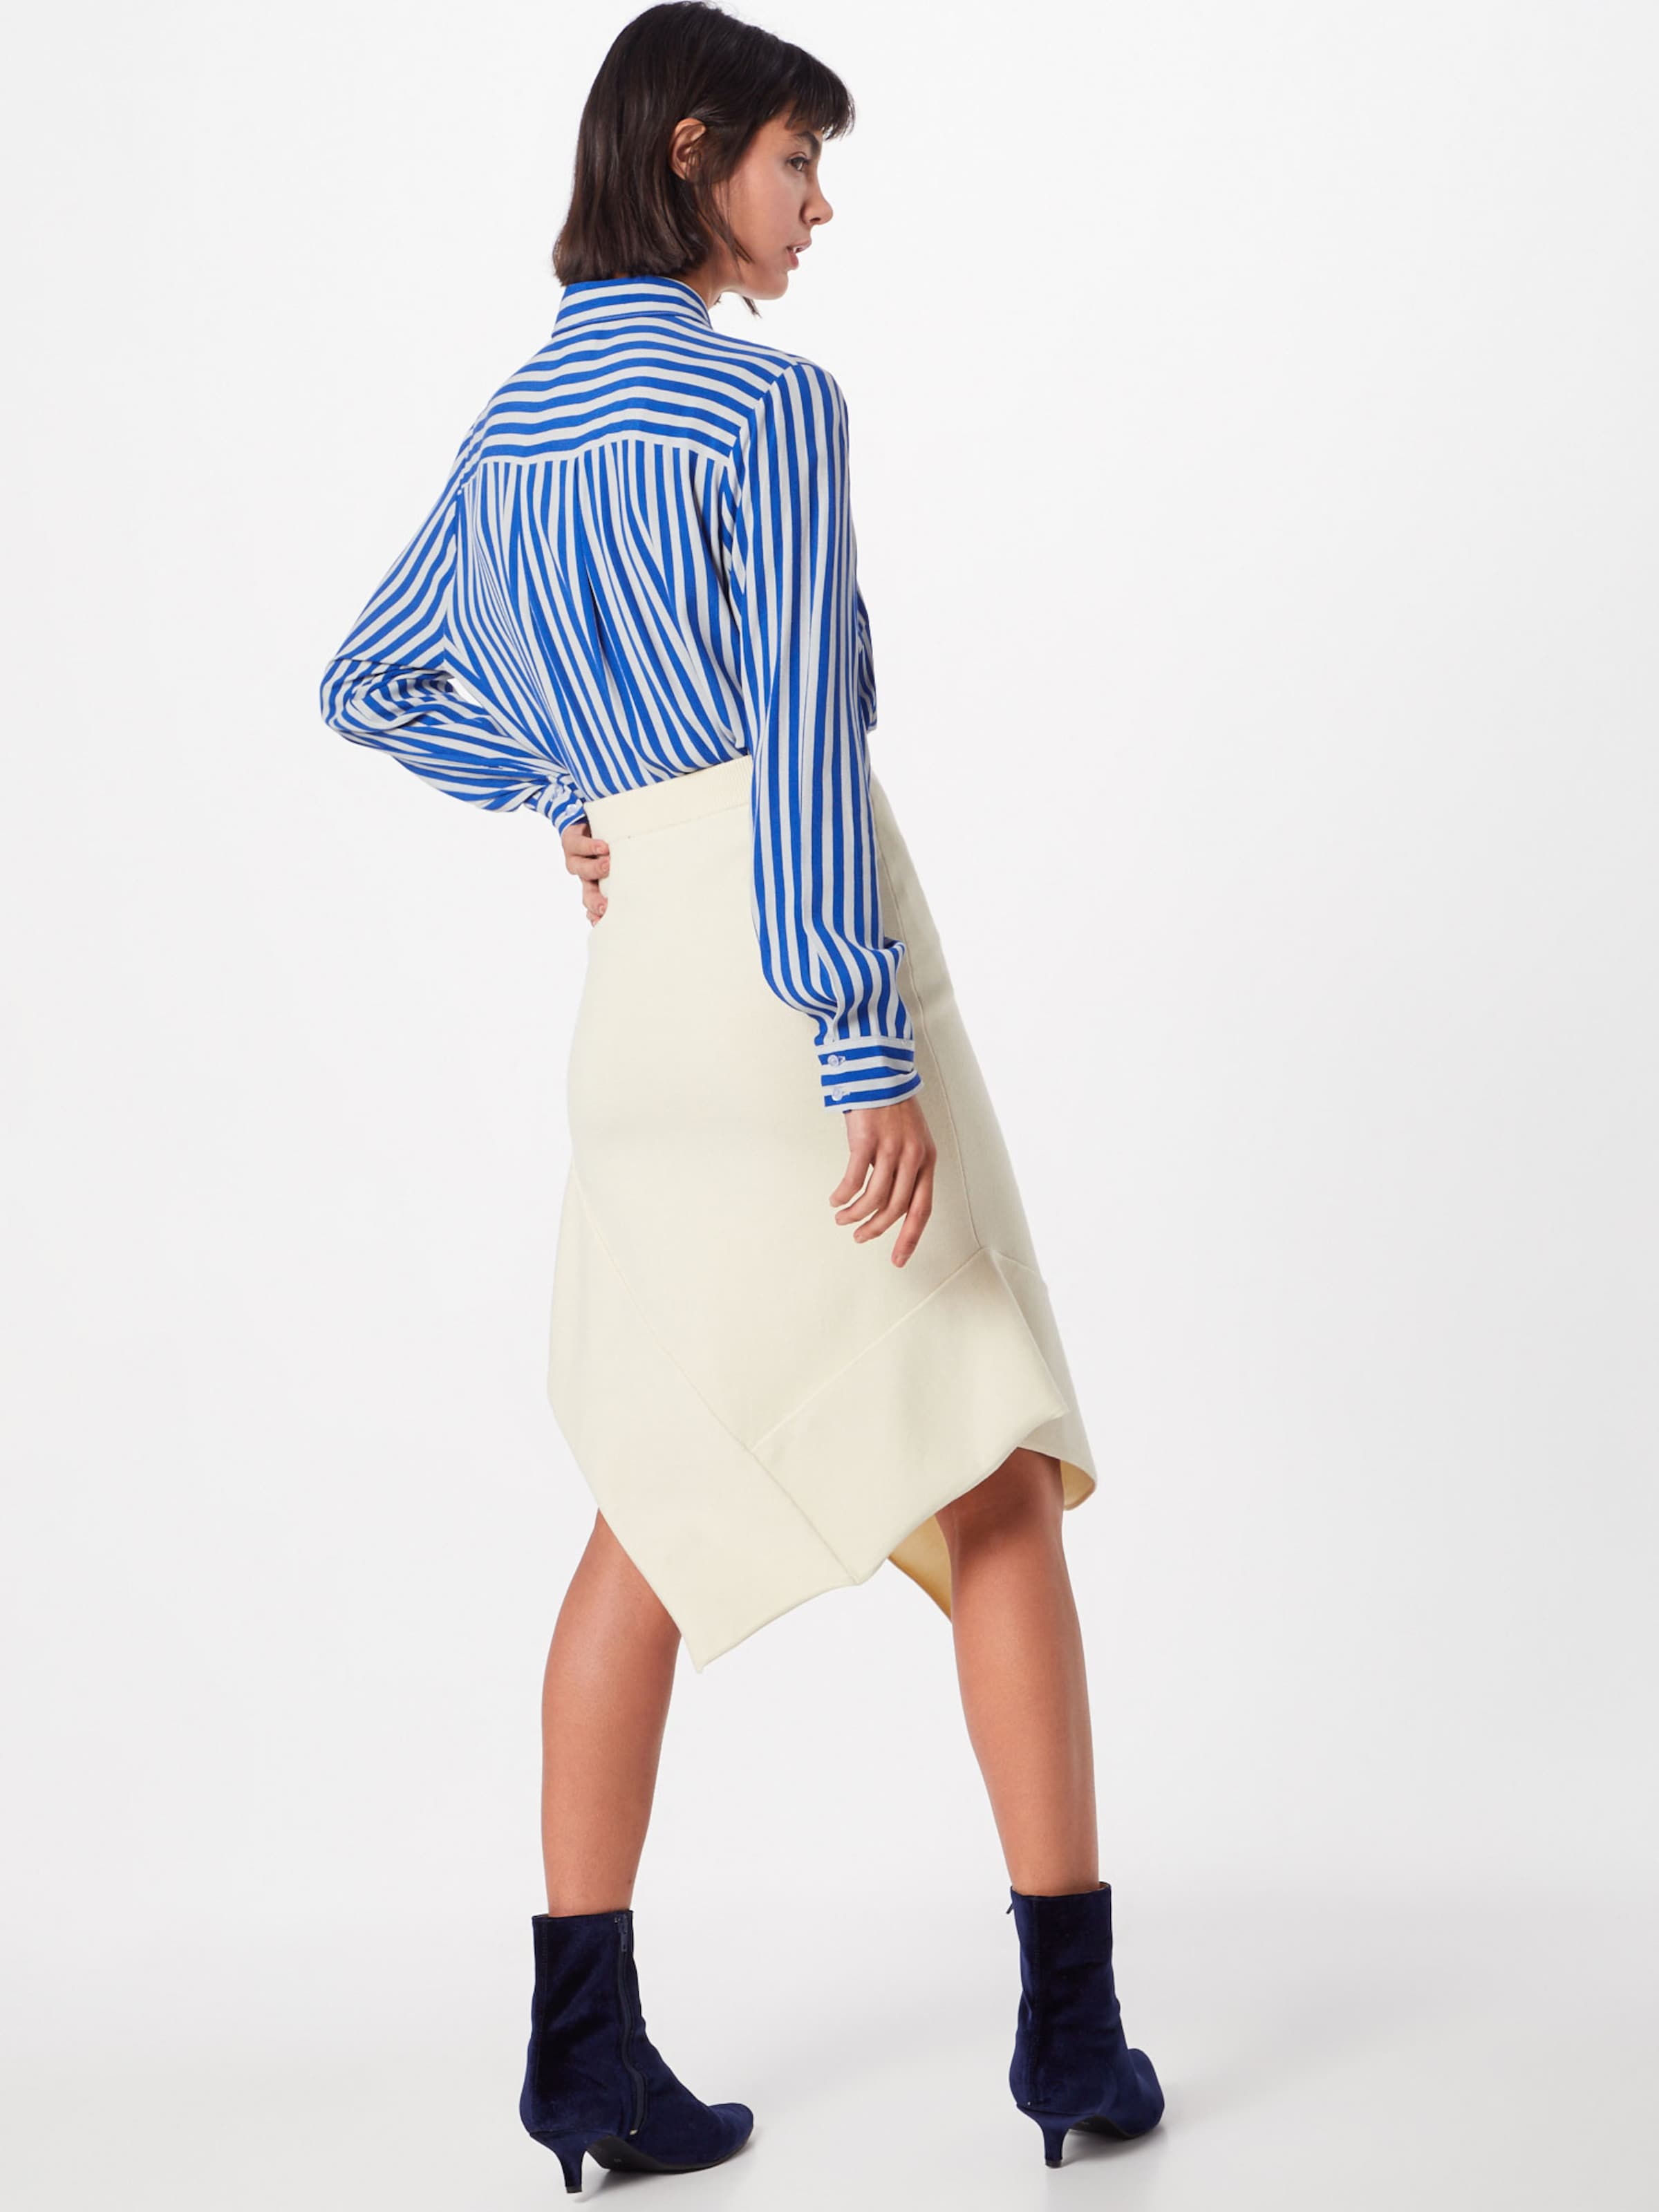 Skirt' Creme Designers In Röcke Remix 'glenda Layer FJl3K1Tc